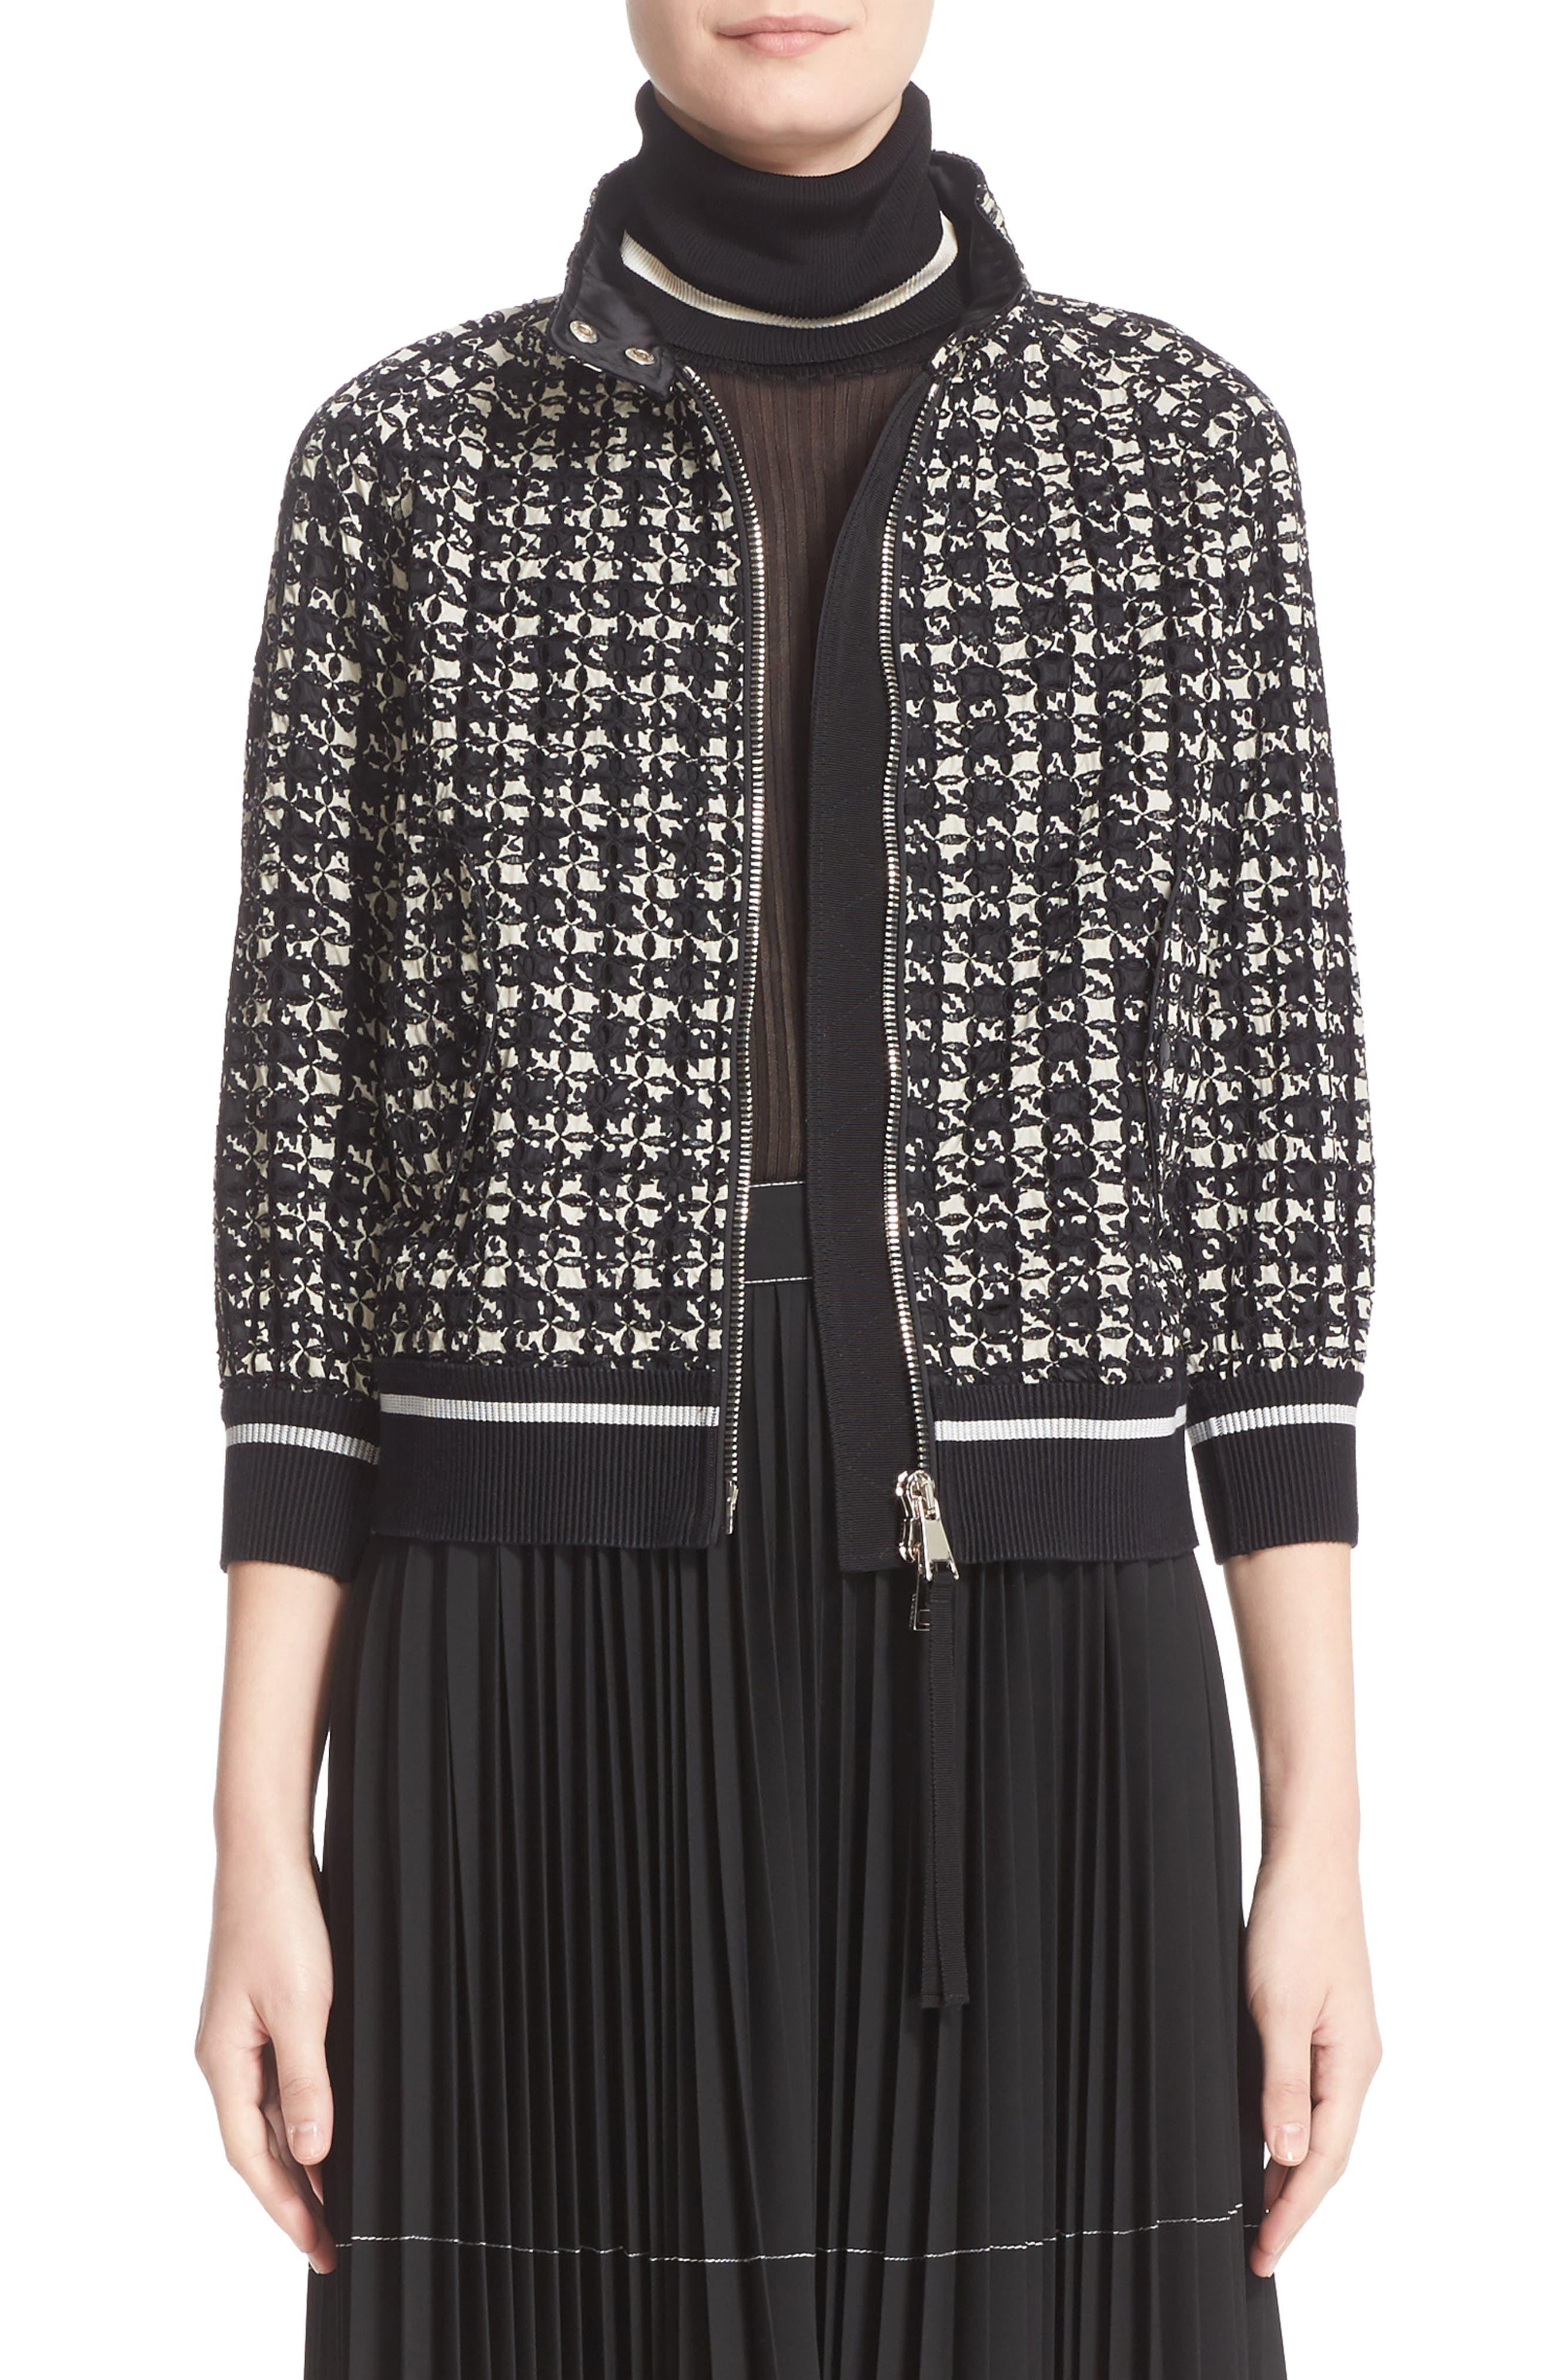 Alternate Image 1 Selected - Moncler Fiadone Tweed Print Jacket